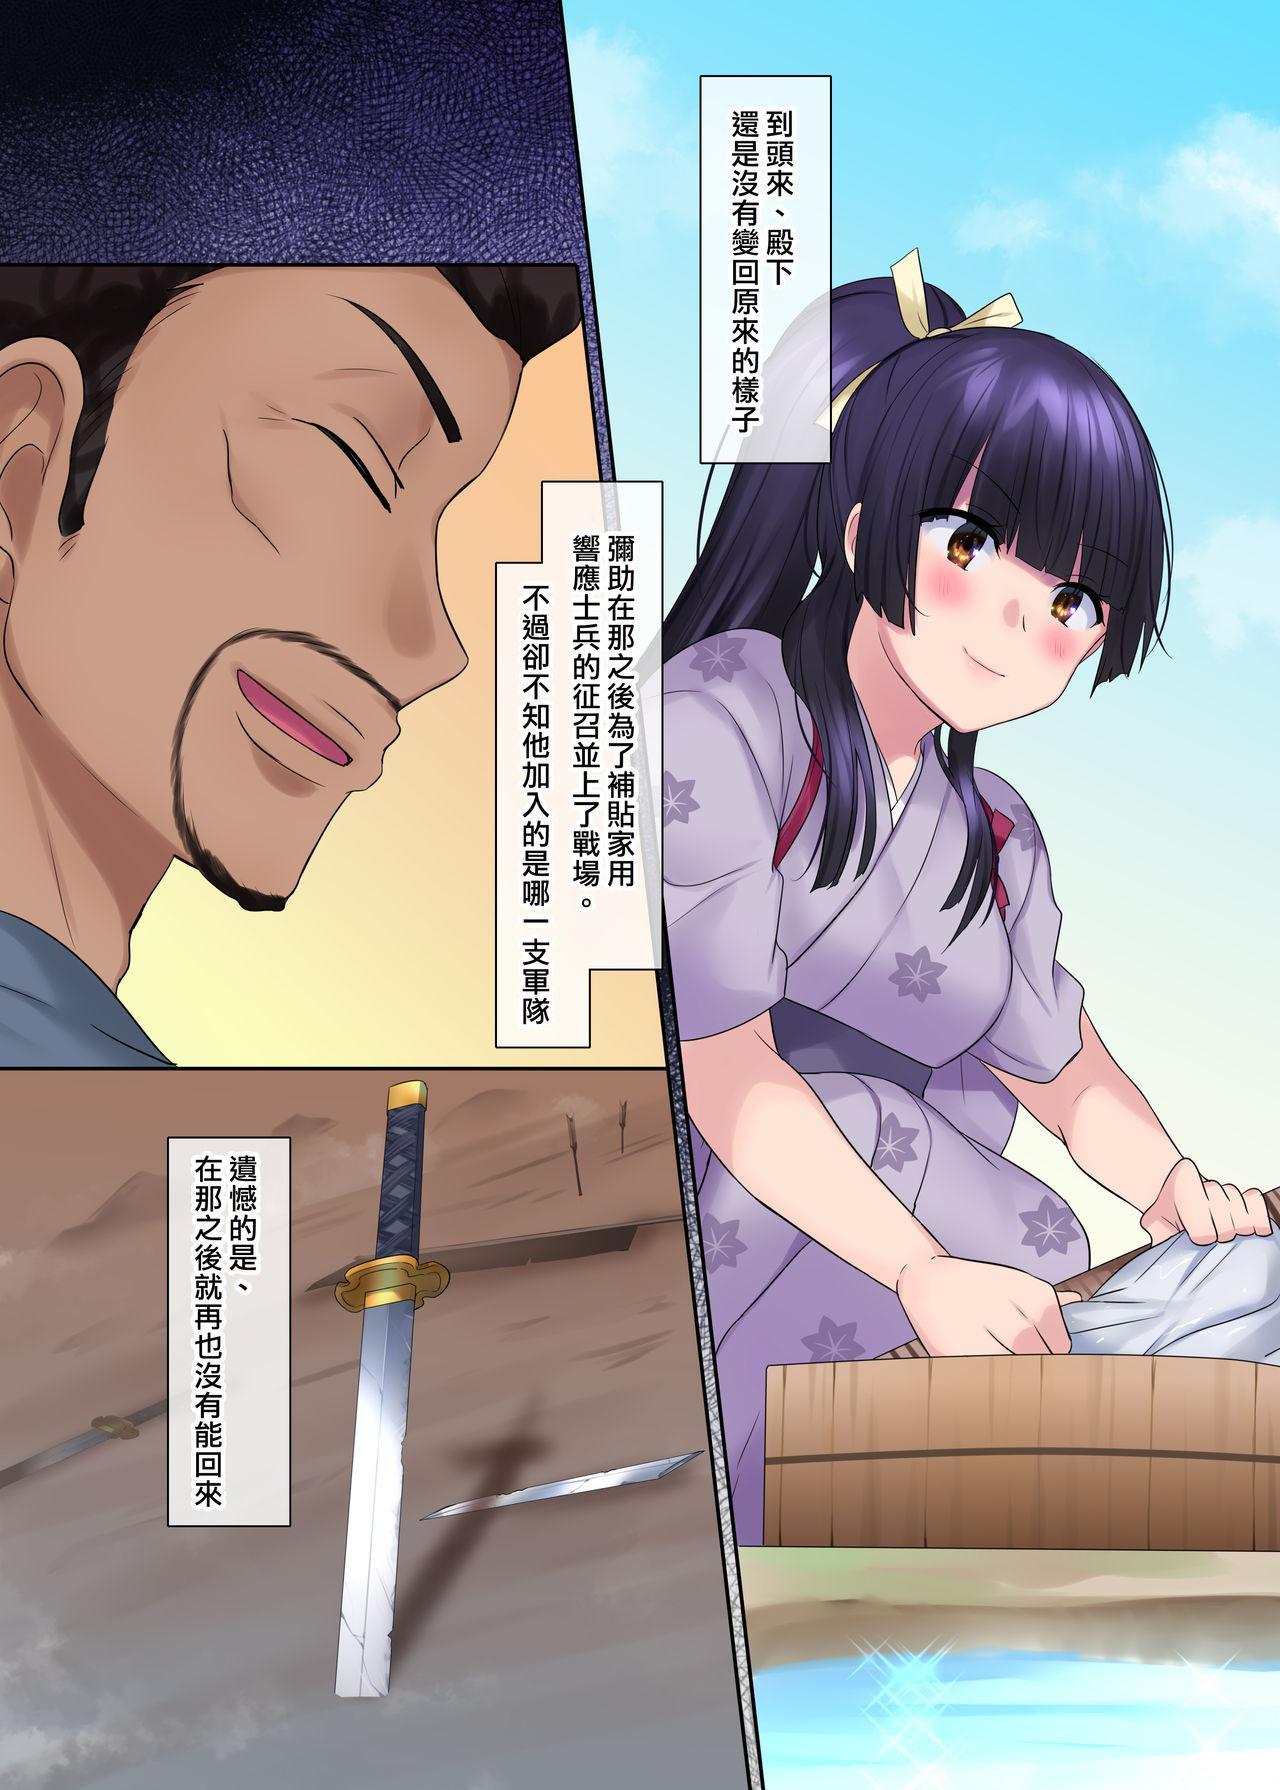 Nobunaga who was made a sexual change woman of Honnoji 39